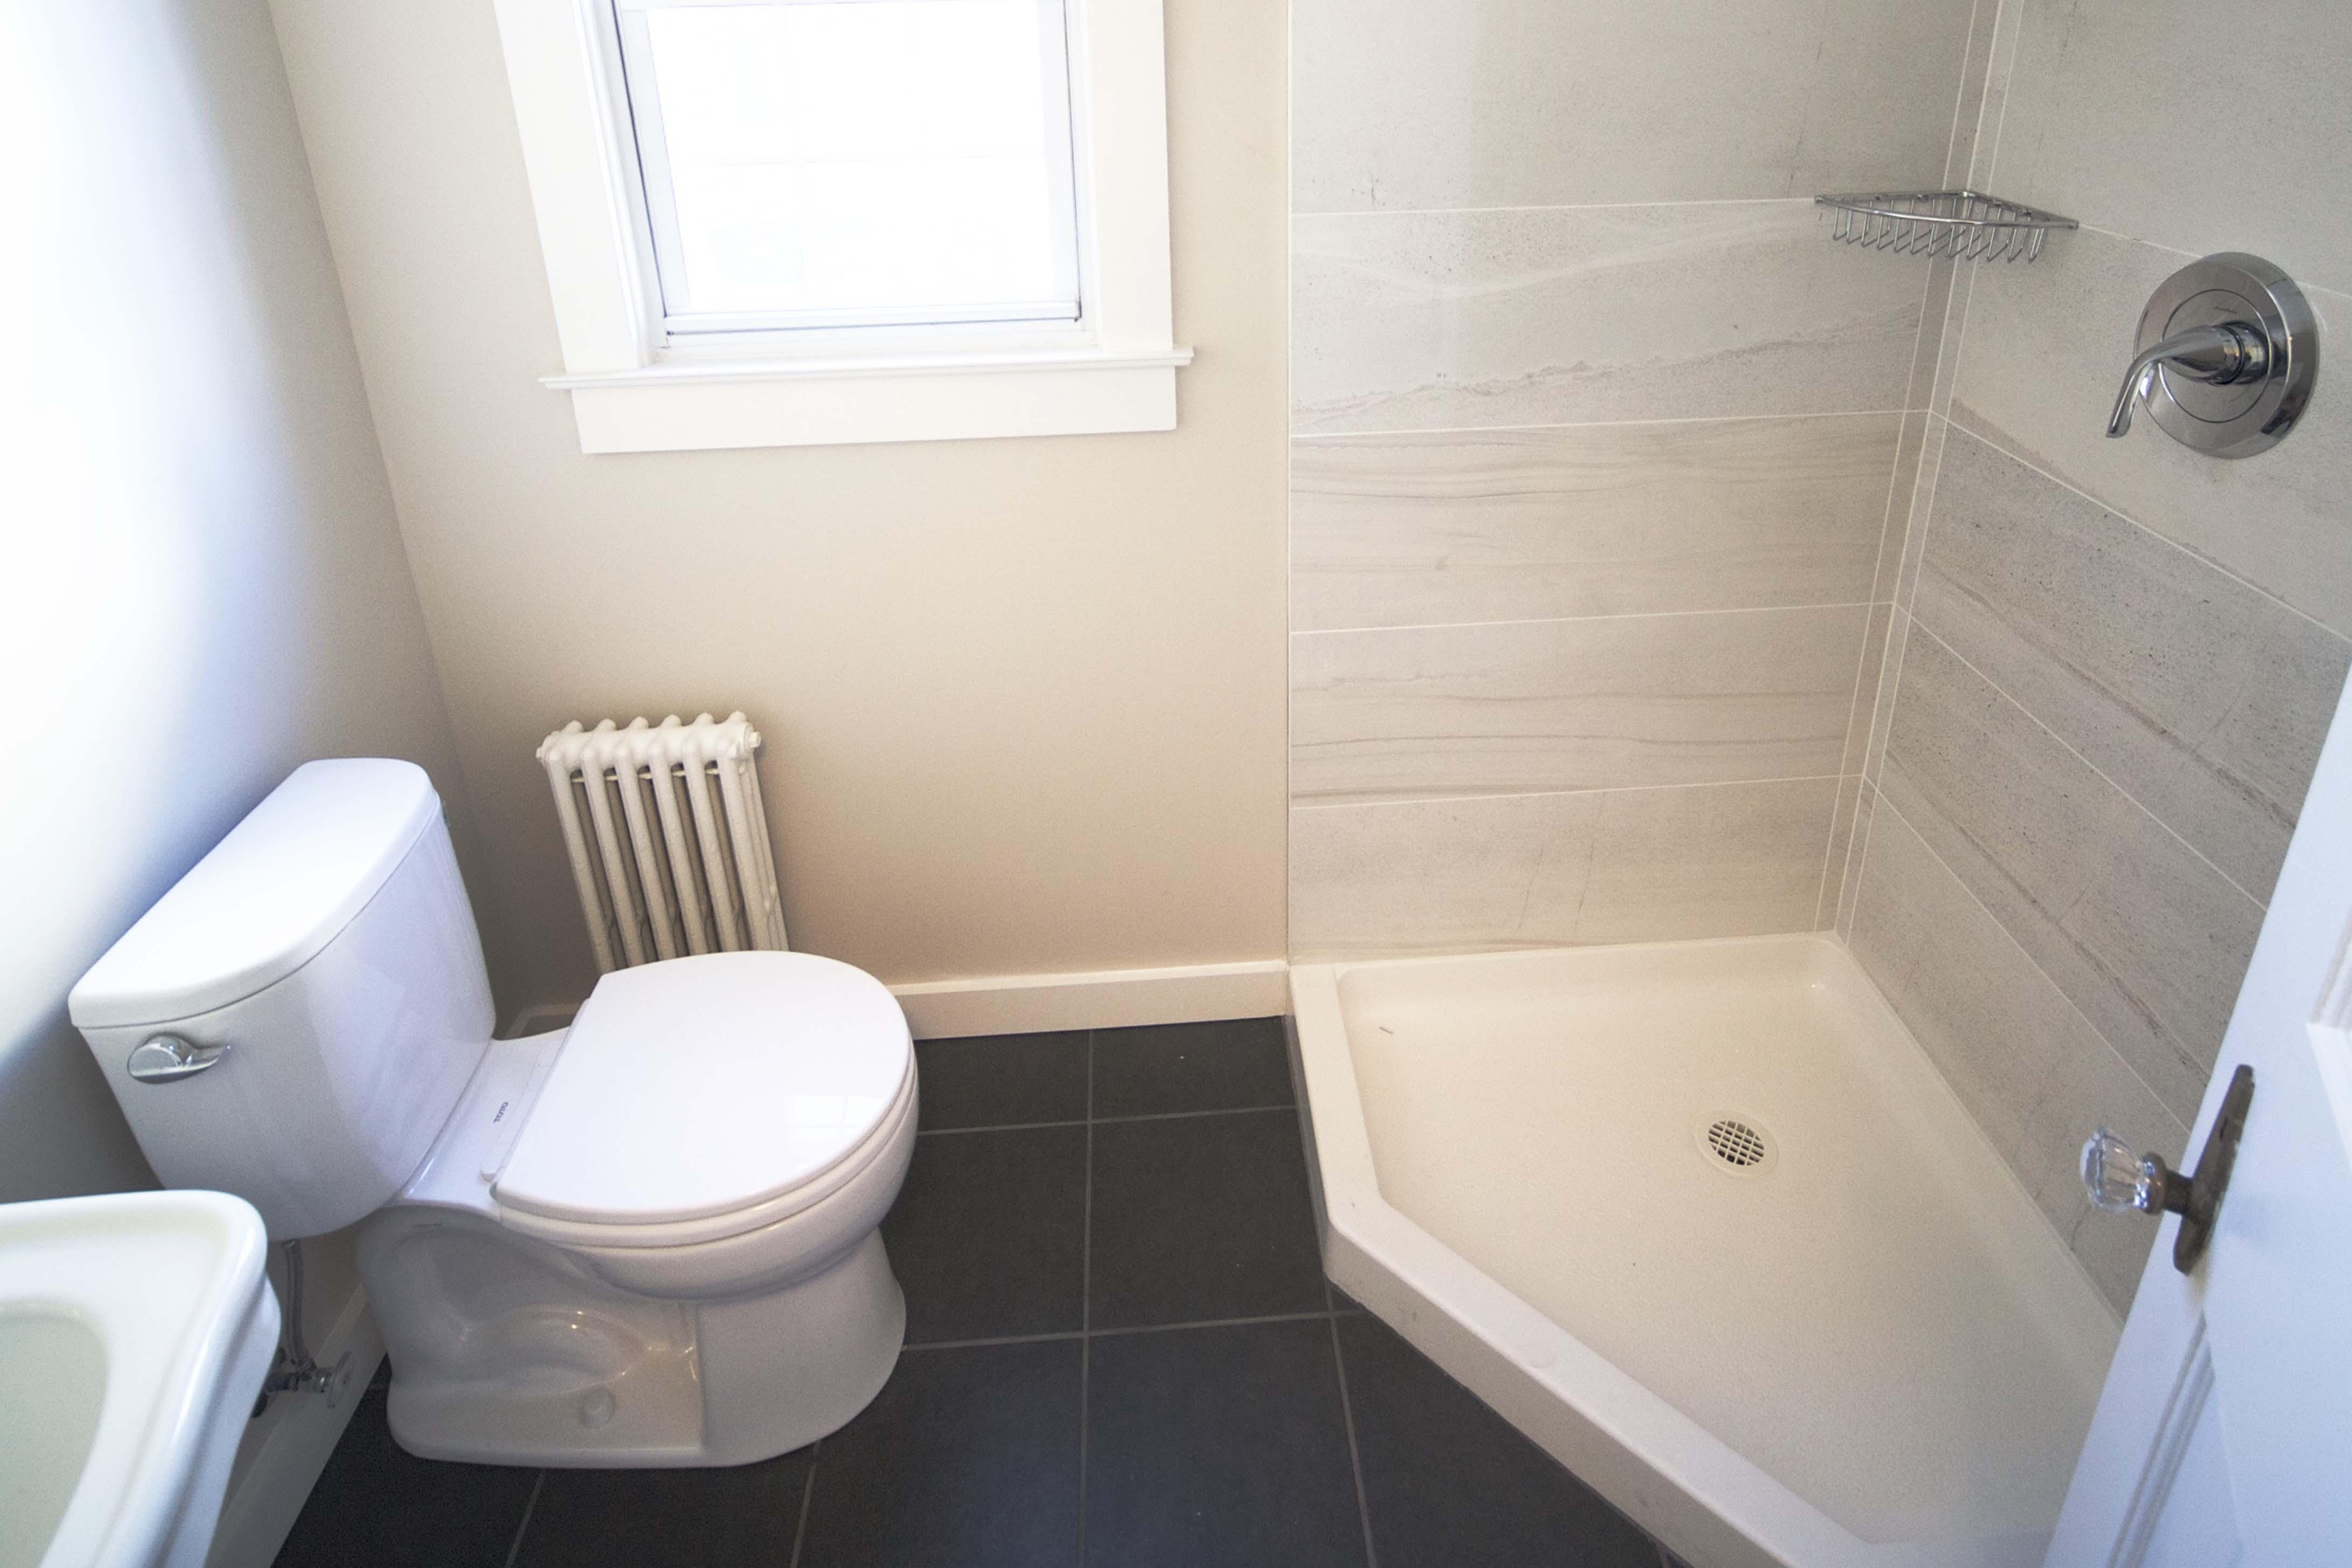 Tile Installation Service In Meriden - Bathroom tile installers near me